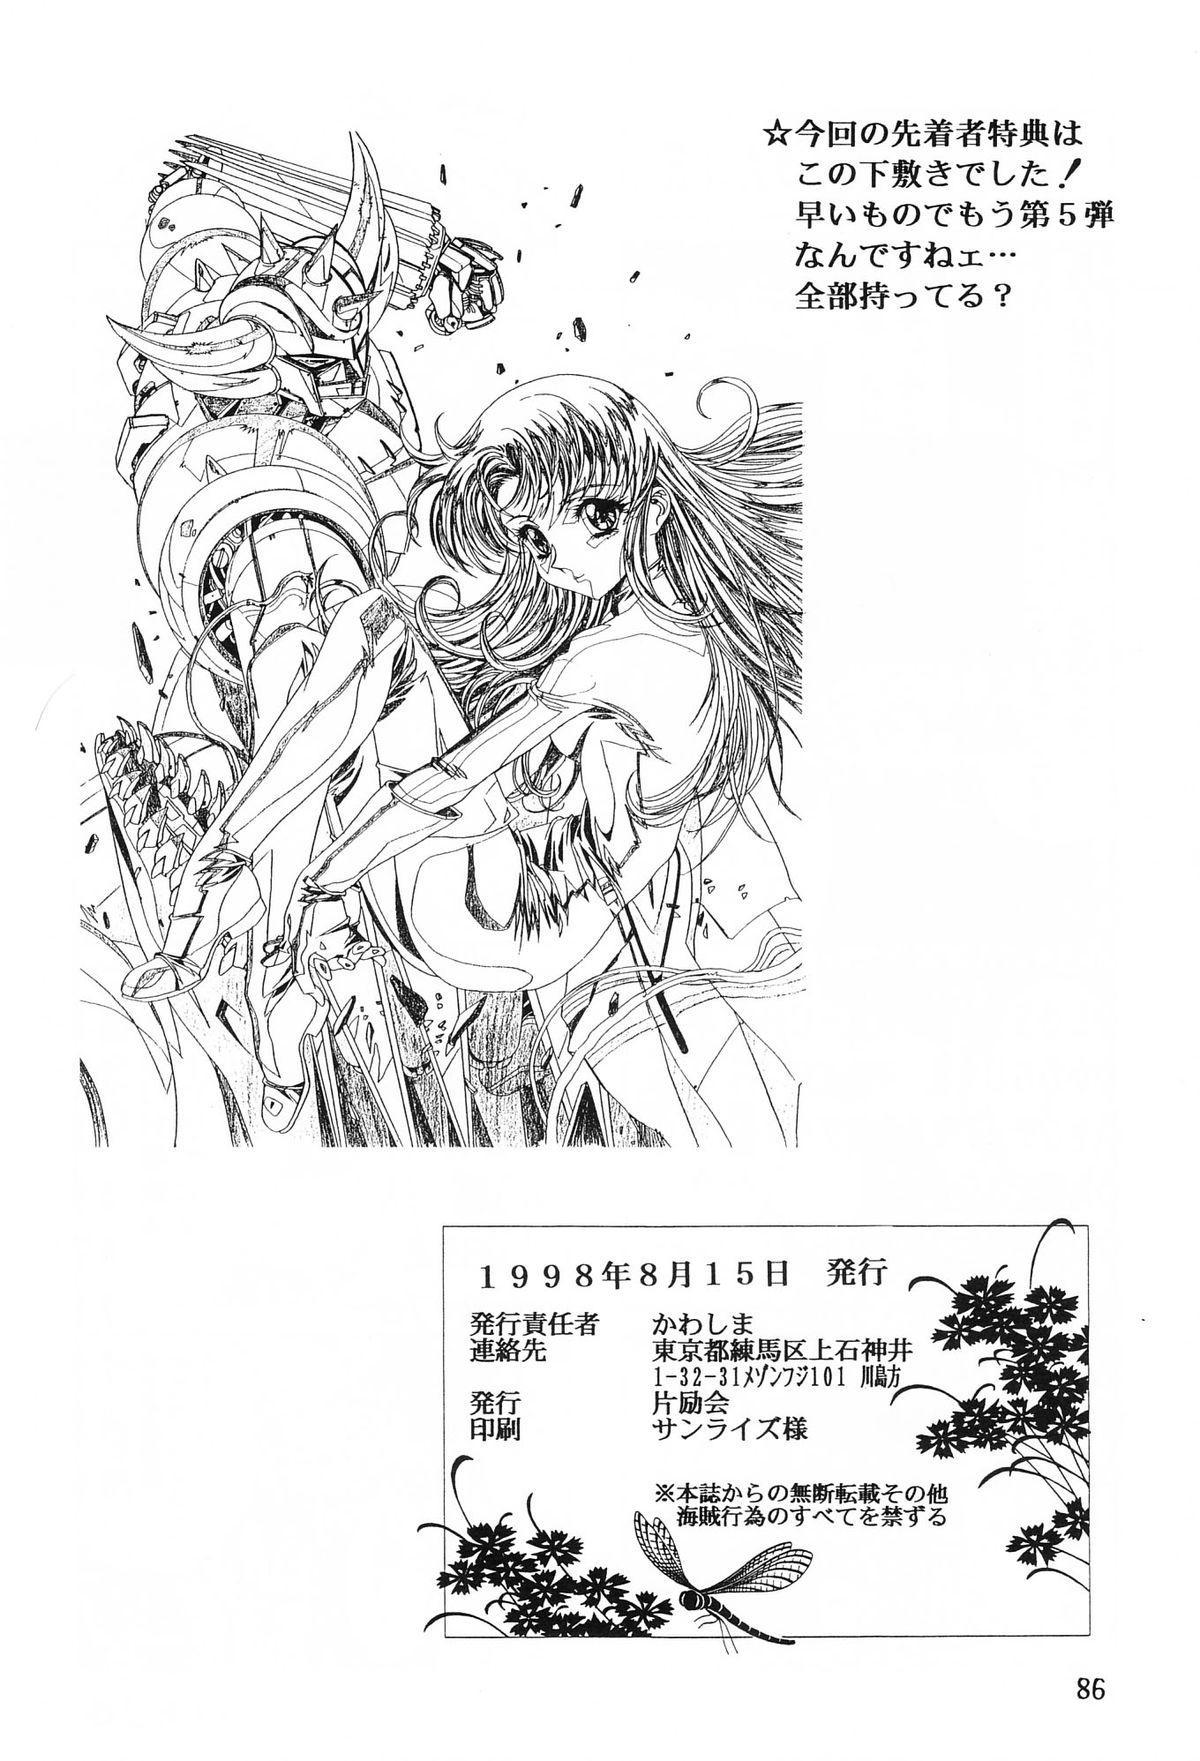 Henrei-kai '98 Natsu SPECIAL 85